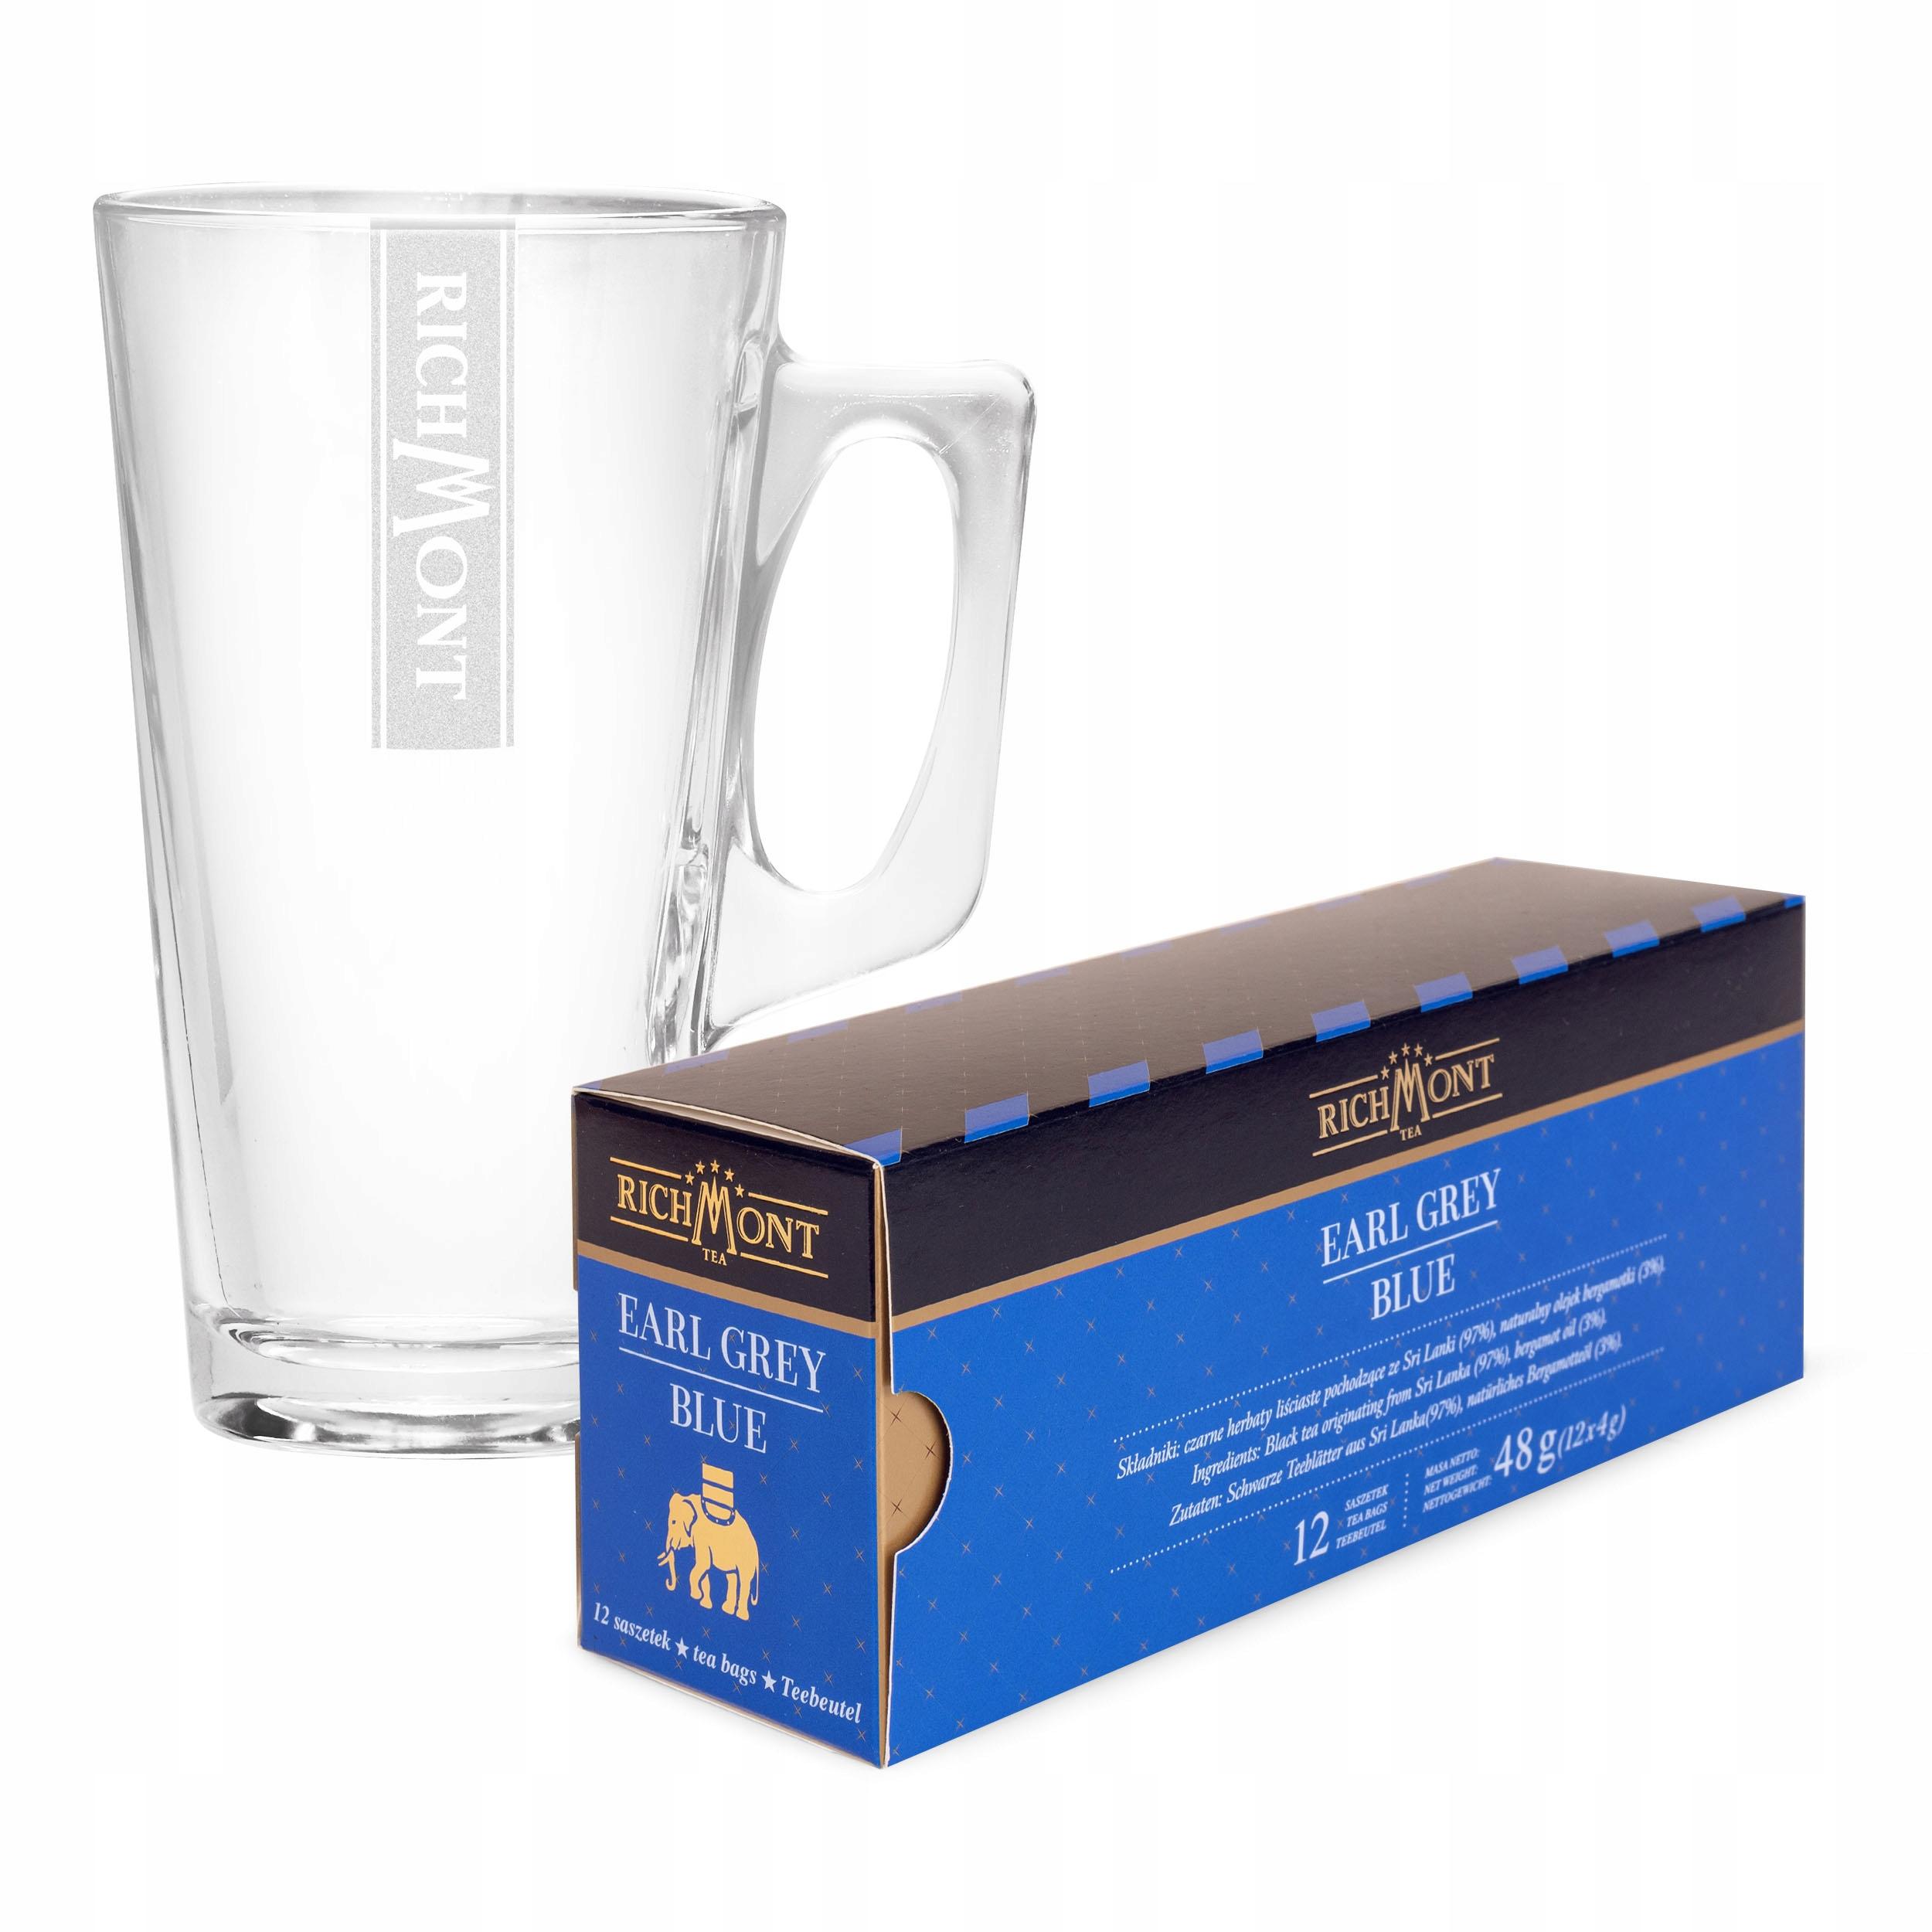 12 Чай Richmont Earl Grey Blue + ГОРЯЧИЙ стакан